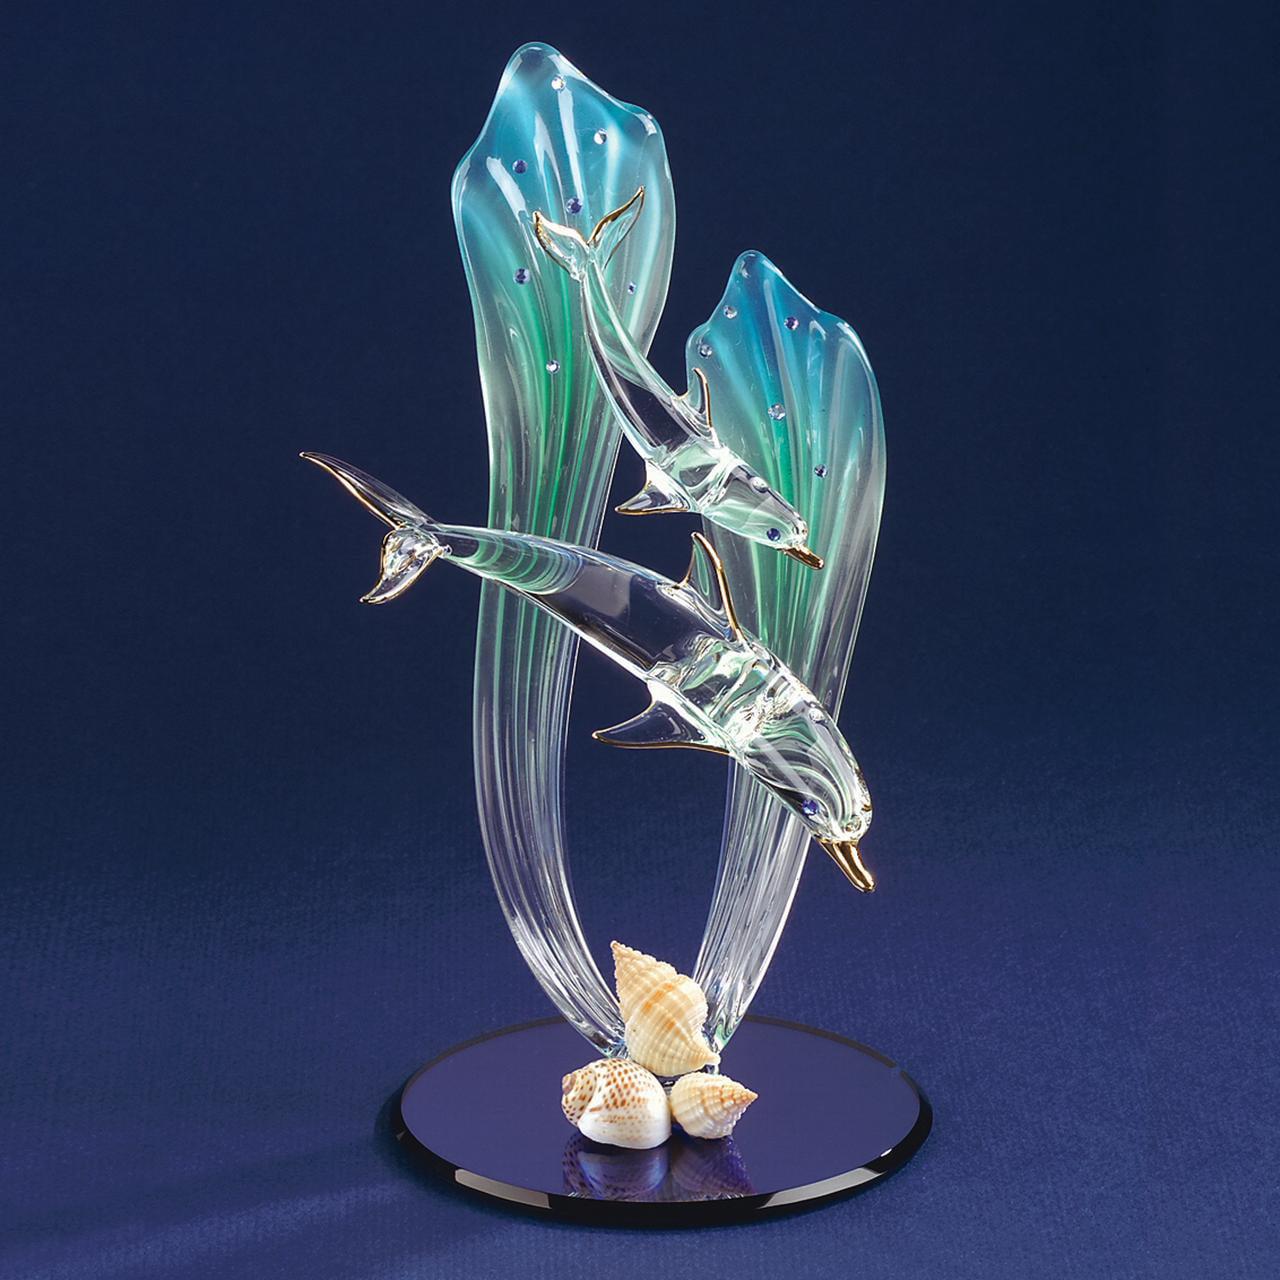 Dolphin Baby Glass Figurine Floral Garden Nautical Pet Animal Glas Baron For Women